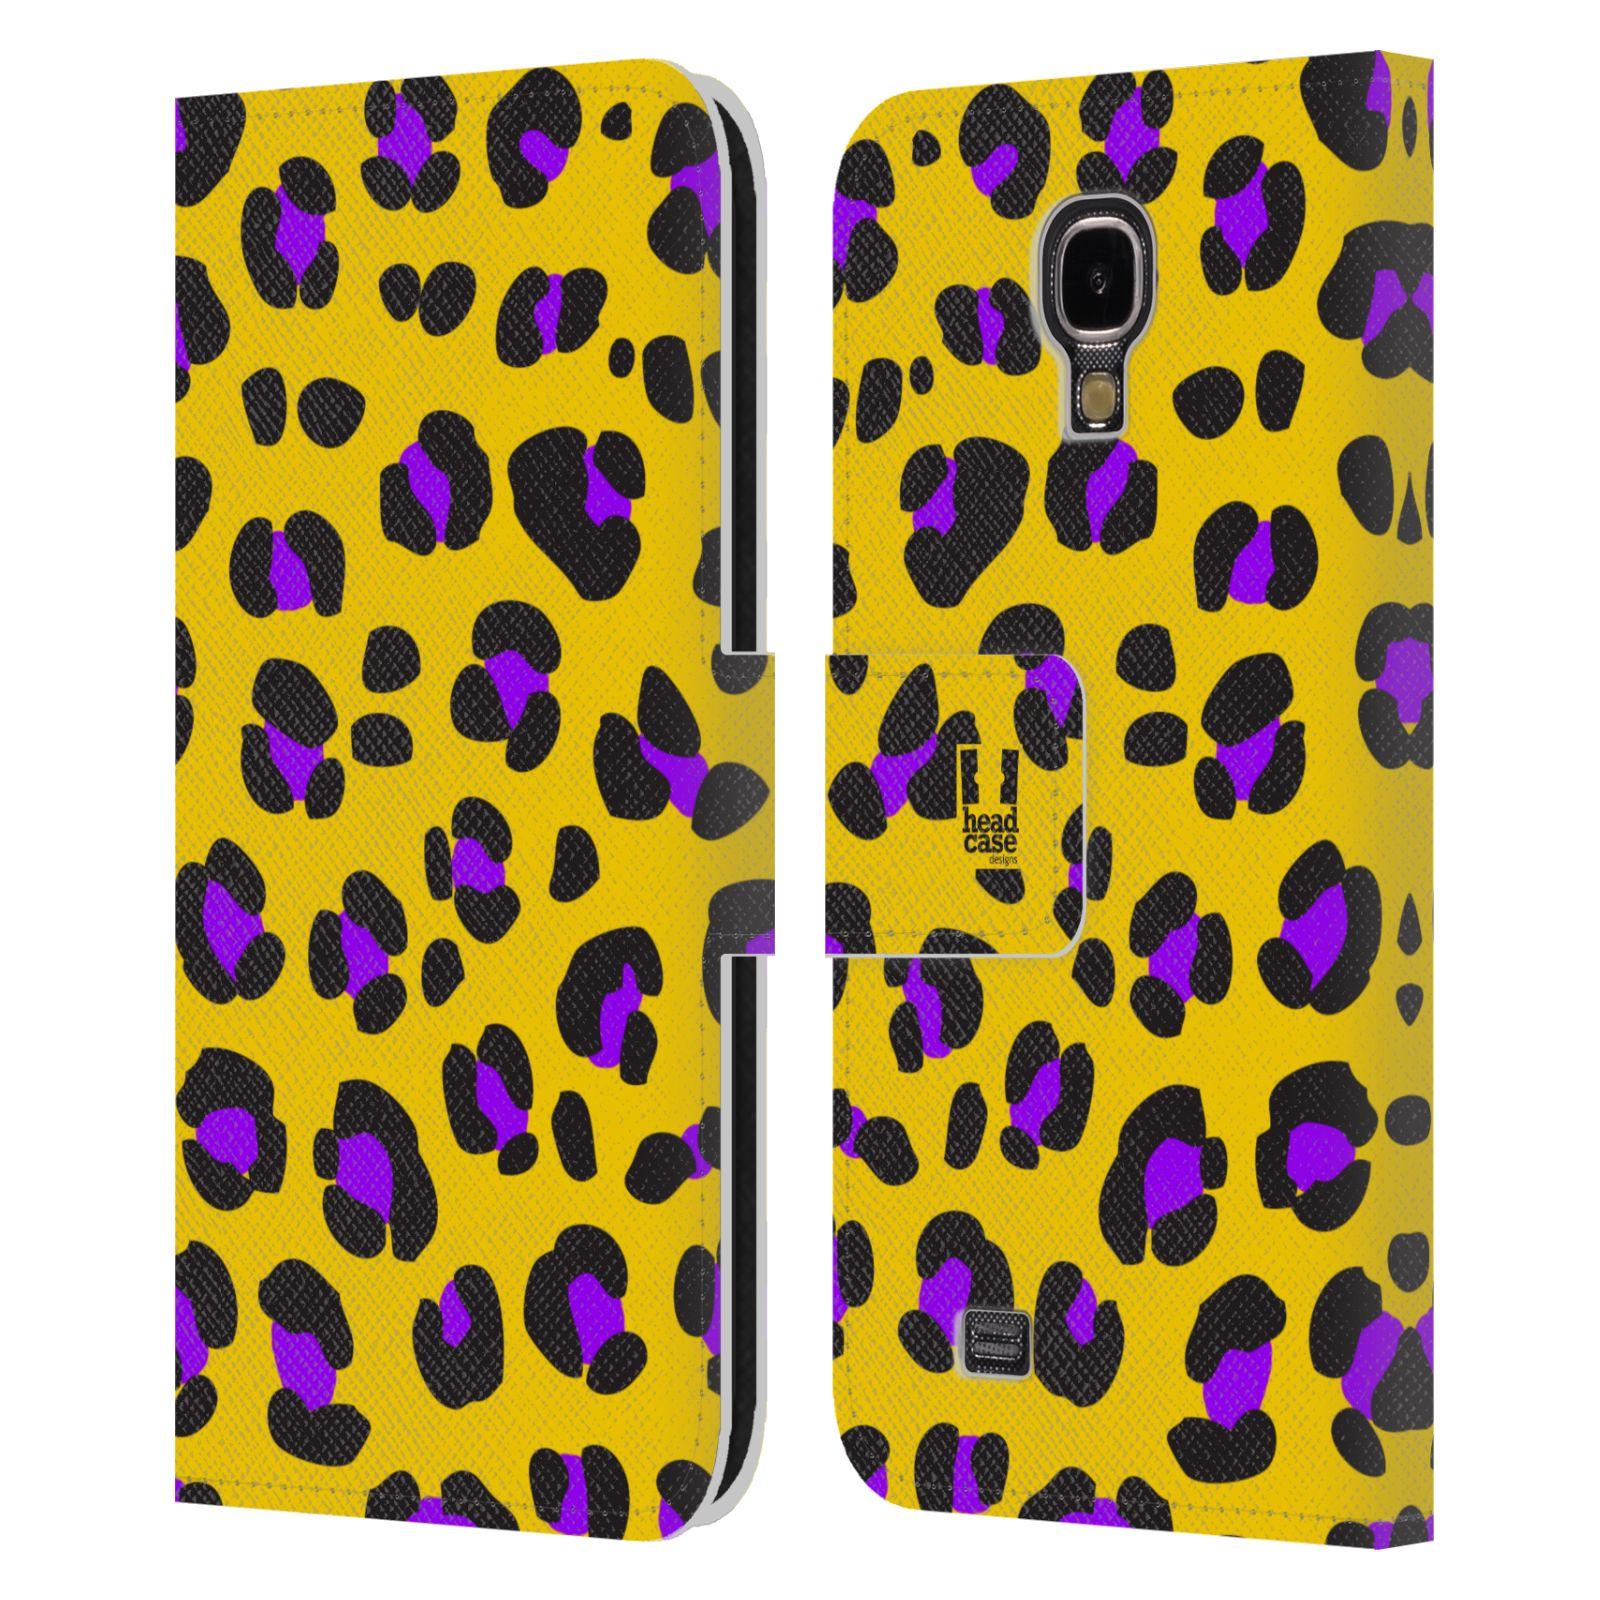 HEAD CASE Flipové pouzdro pro mobil Samsung Galaxy S4 Zvířecí barevné vzory žlutý leopard fialové skvrny